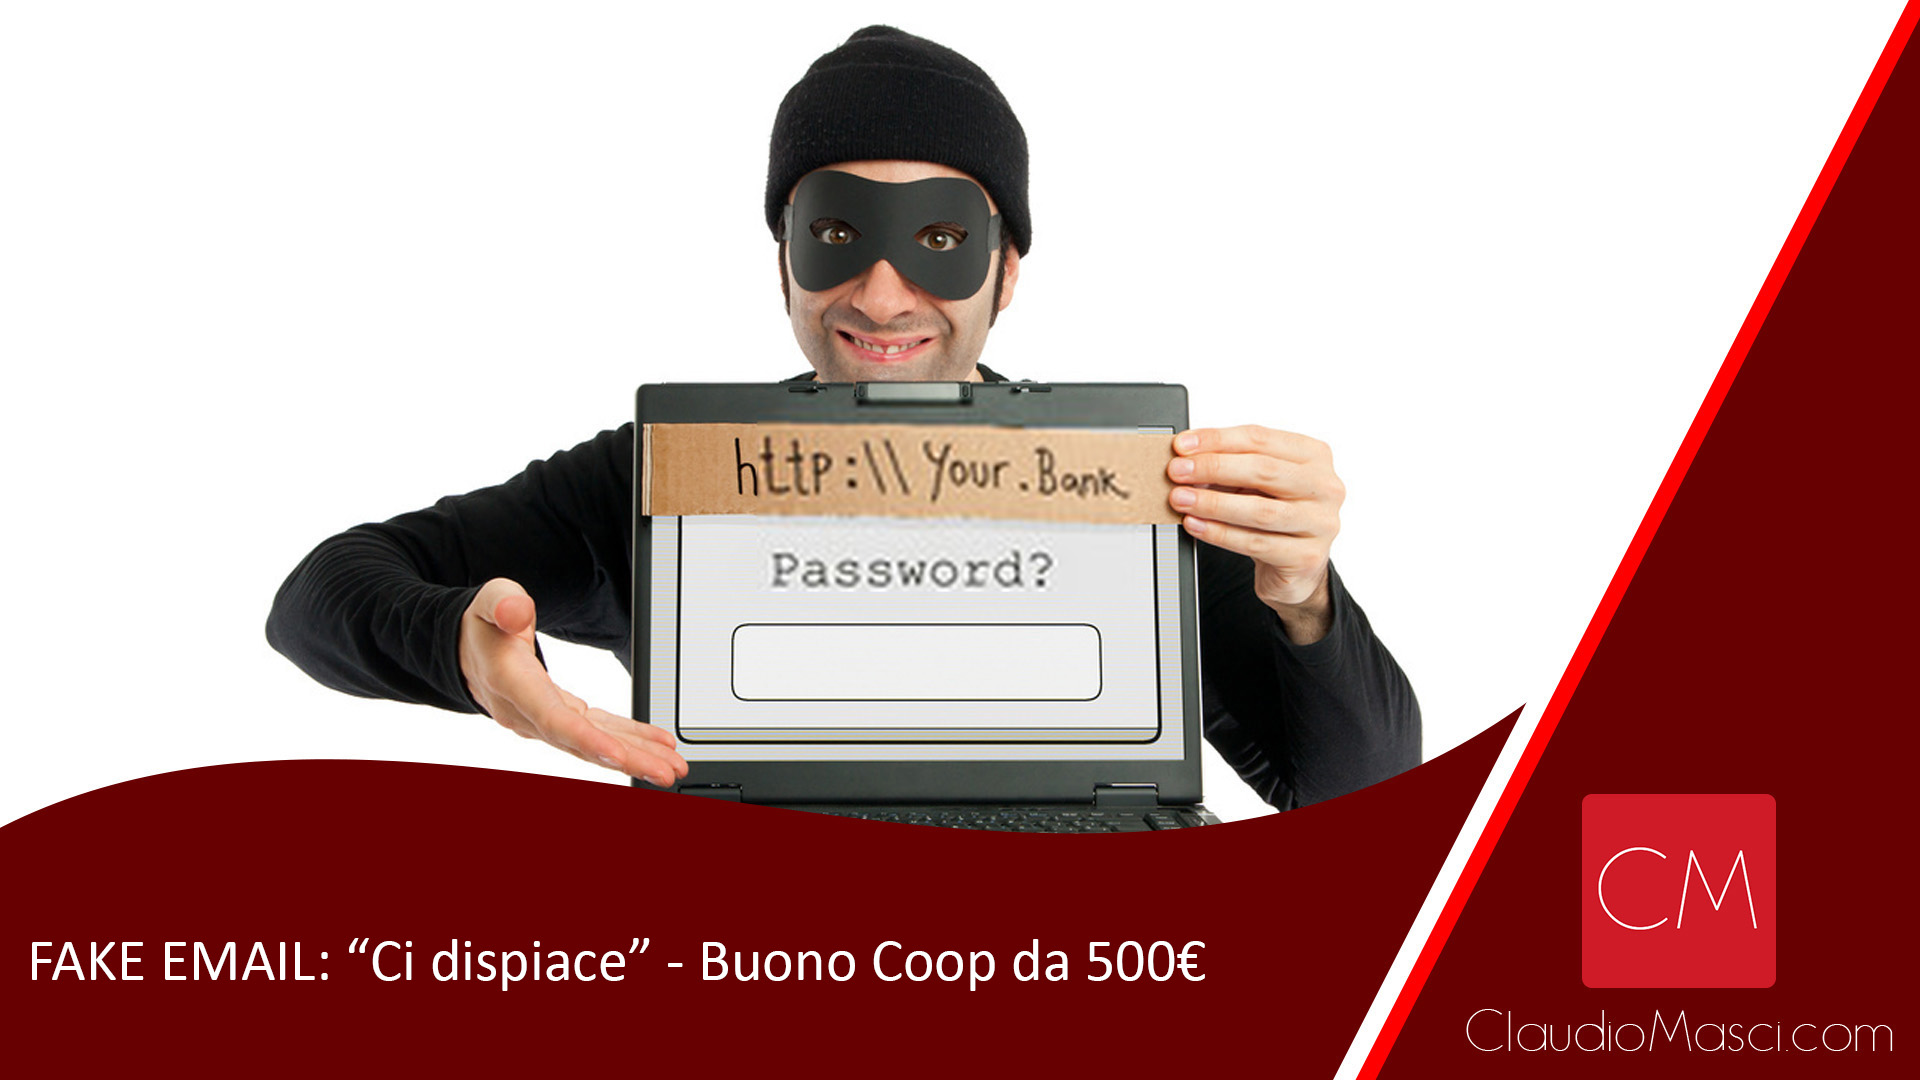 FAKE EMAIL: Ci dispiace – Buono COOP da 500€